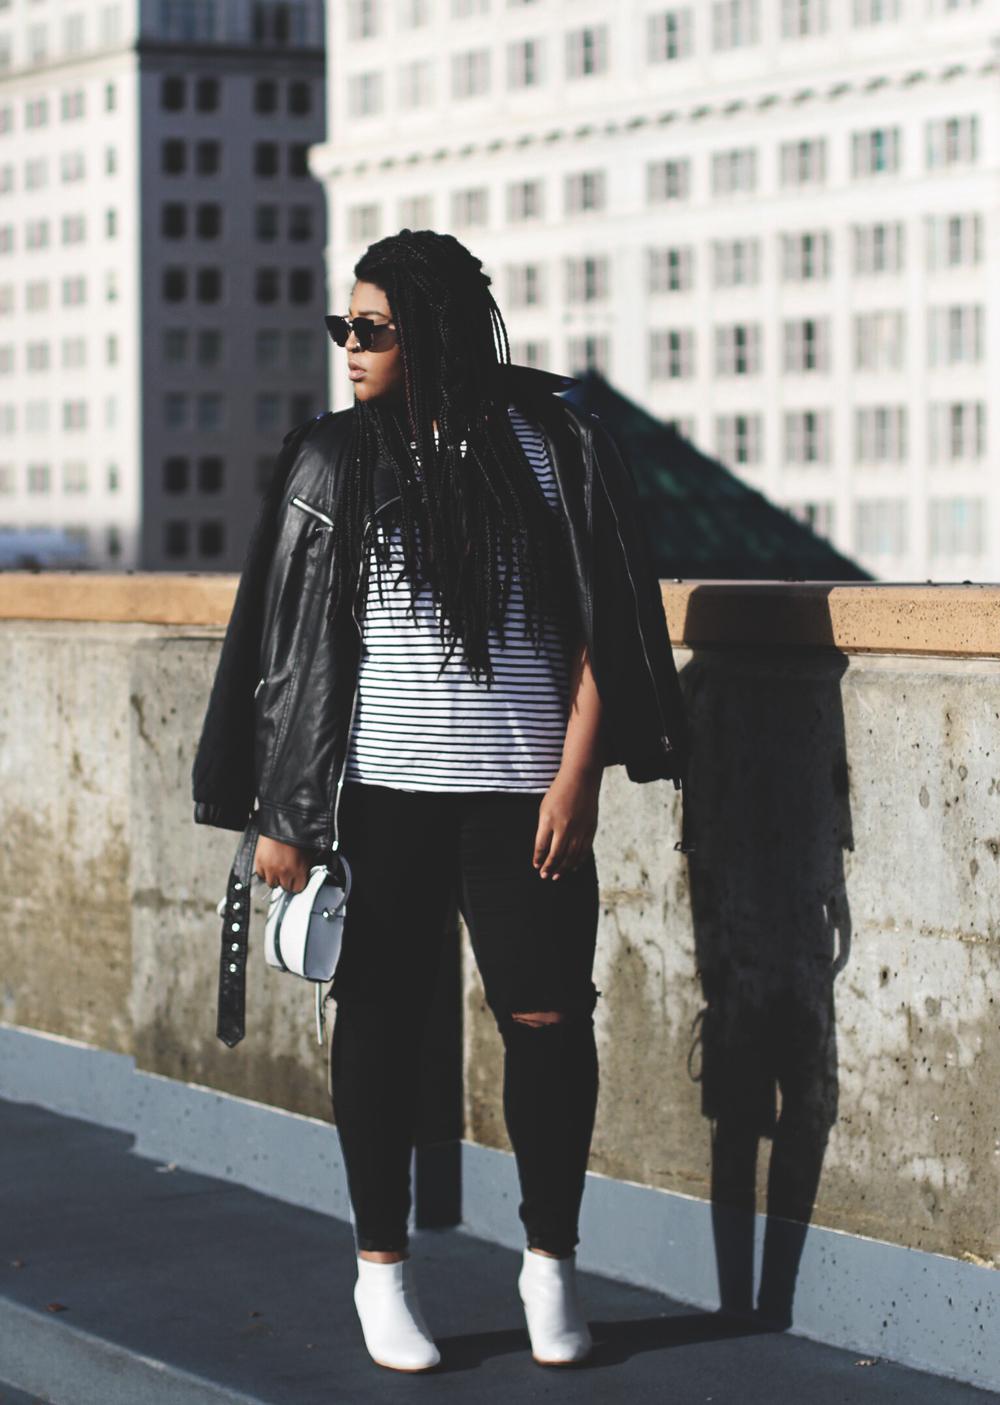 Jacket & Sunglasses - F21, Shirt  - American Apparel,  Bag  - H&M,  Jeans  - Garage,  Boots  - Solestruck